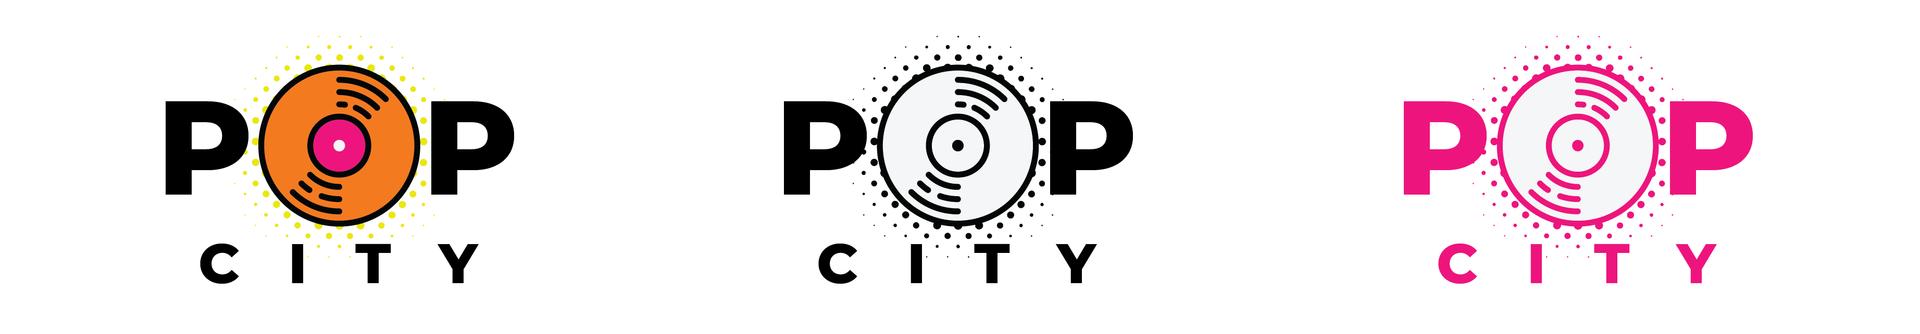 popcityartboard-26-2x_orig.png